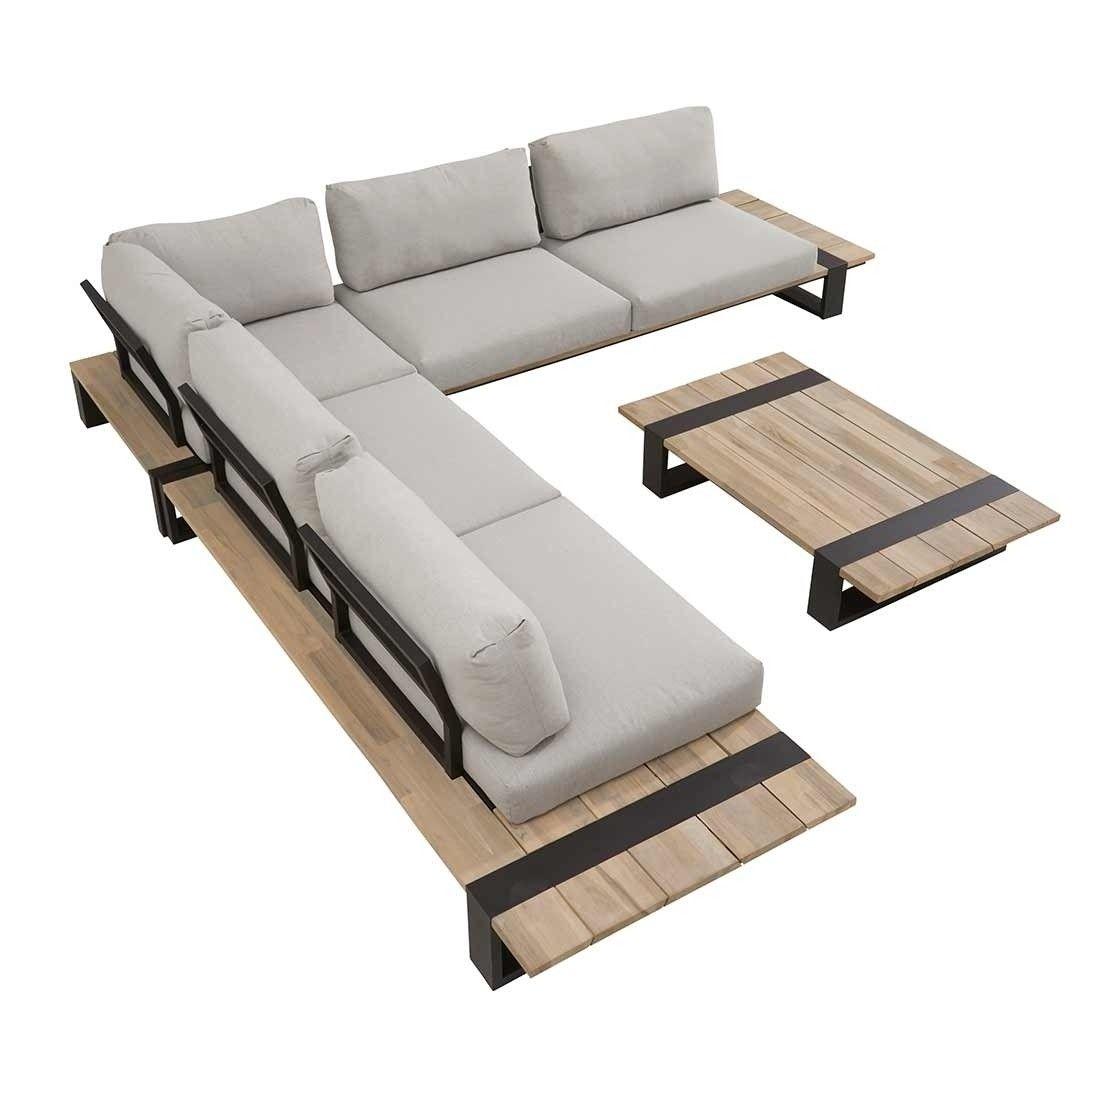 Gartenmobel Design 4seasons Duke Loungemobel Modern Loungeecke 4 Tlg Edelstahl Textil Olefin Outdoormobel Gartenl Garten Lounge Gartenmobel Design Lounge Mobel